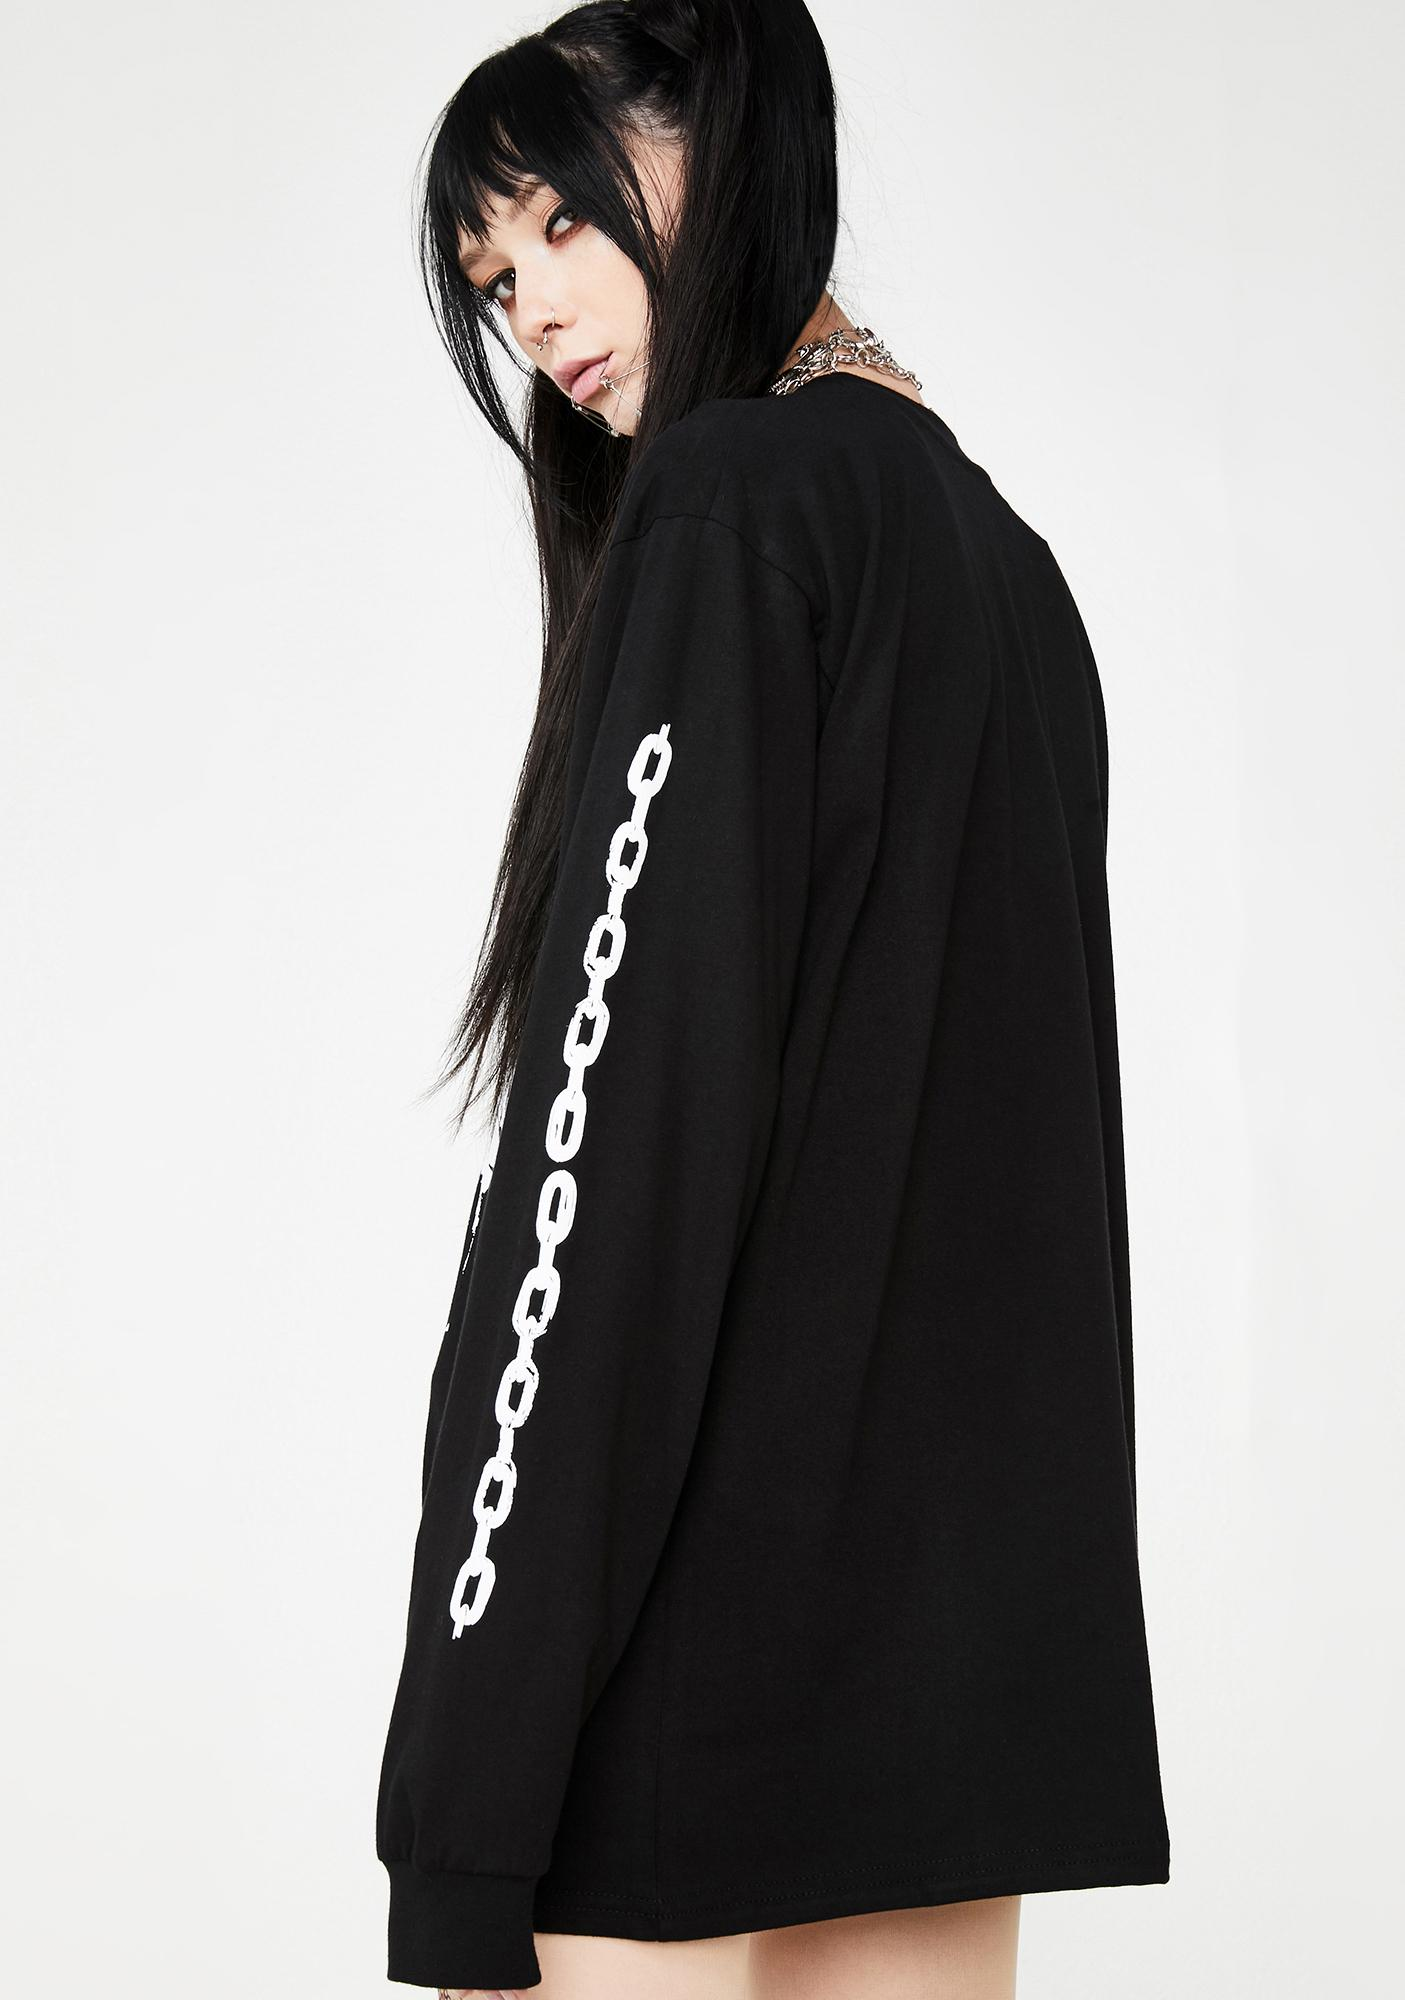 Dreamland Syndicate Widow Long Sleeve Tee